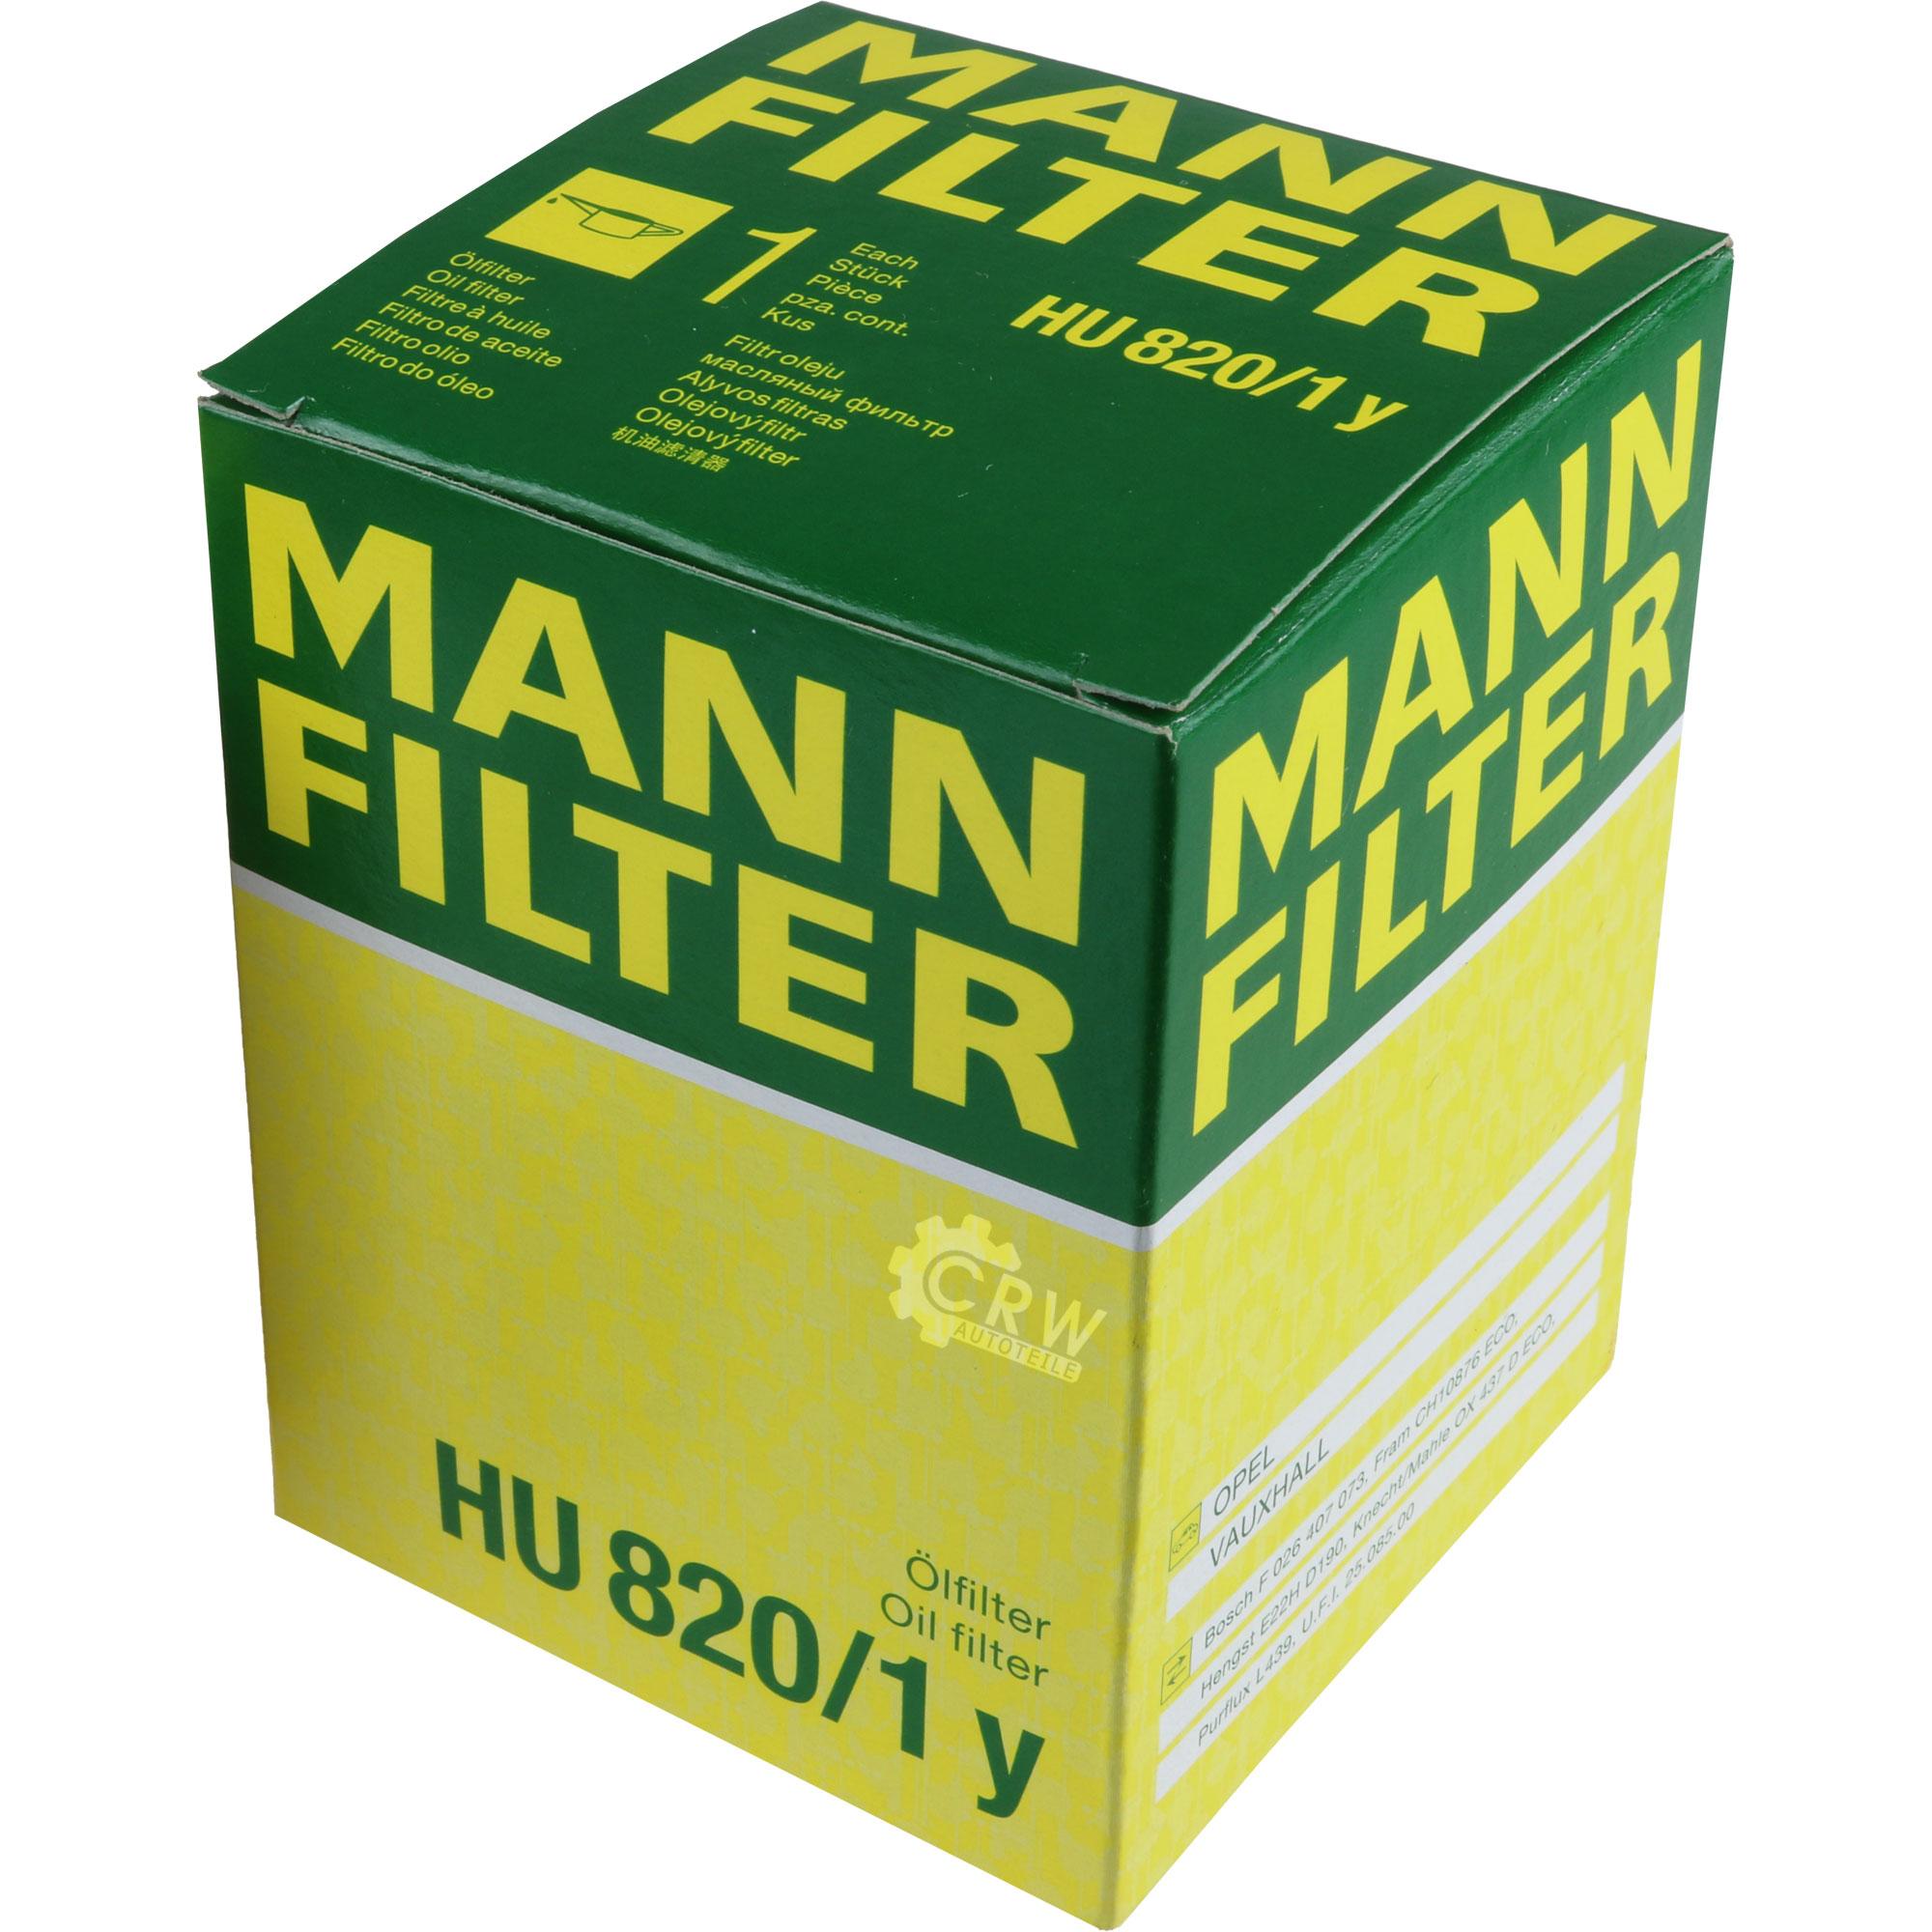 MANNOL-6L-Extreme-5W-40-Motor-Ol-MANN-FILTER-Opel-Astra-Sports-Tourer-J-1-7-CDTi